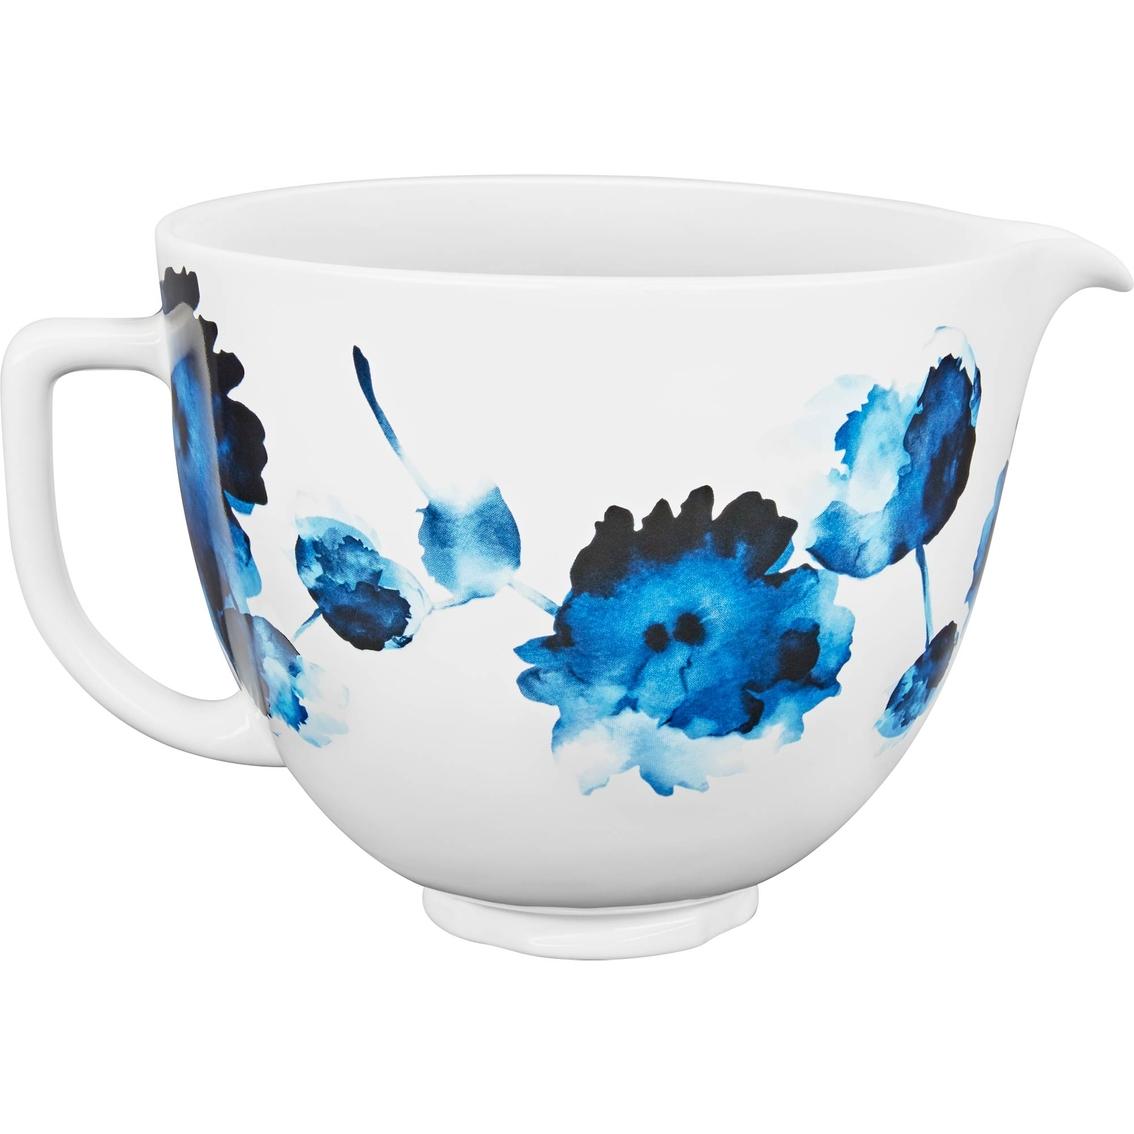 Kitchenaid 5 Quart Ink Watercolor Ceramic Bowl Wow Gifts